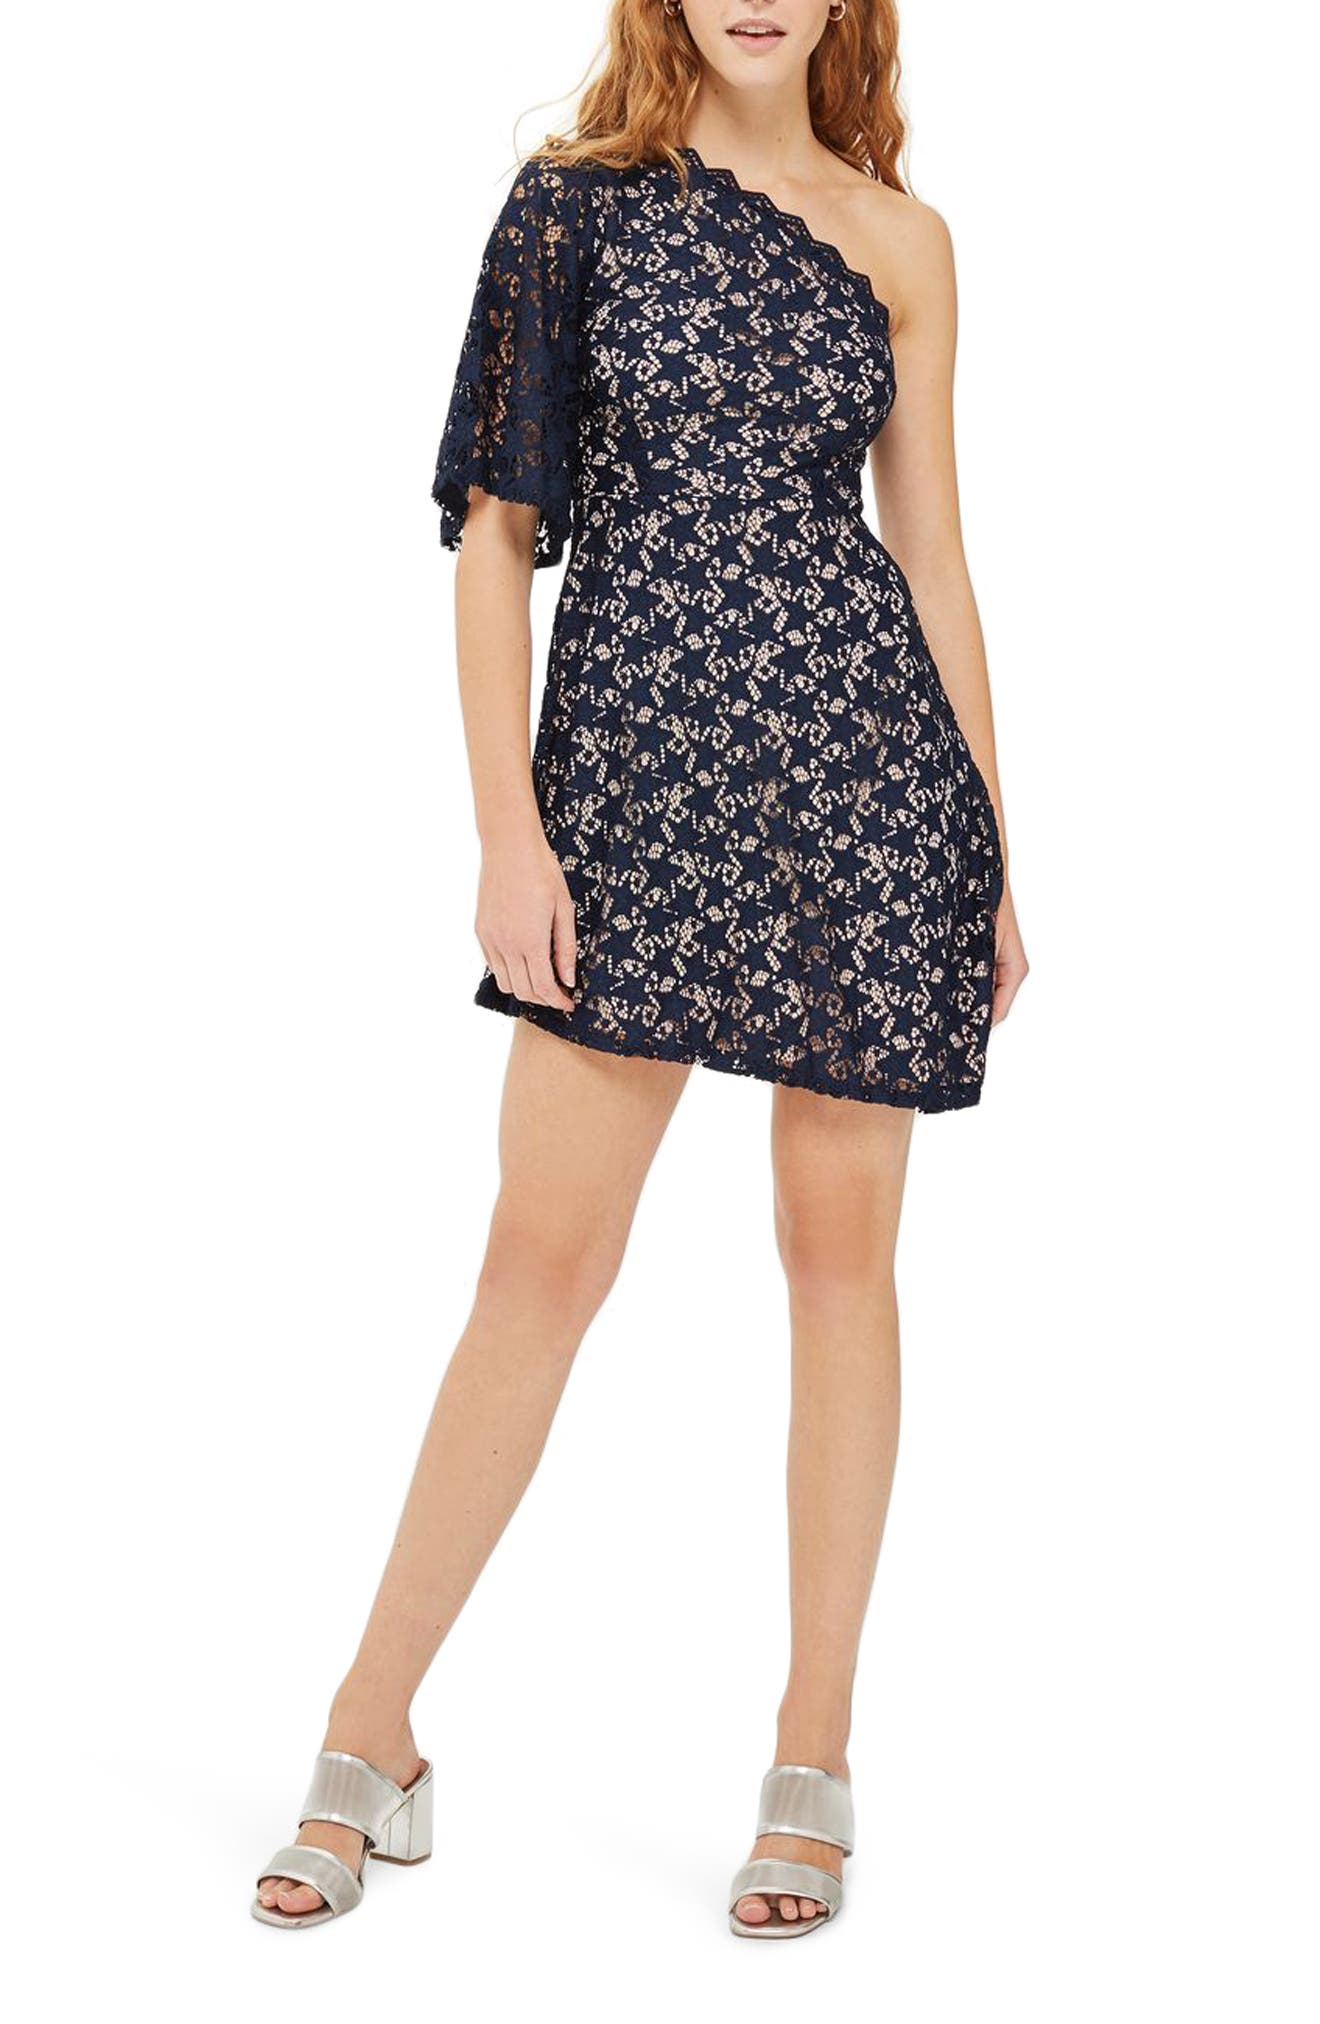 Star Print Lace Minidress,                         Main,                         color, Navy Blue Multi